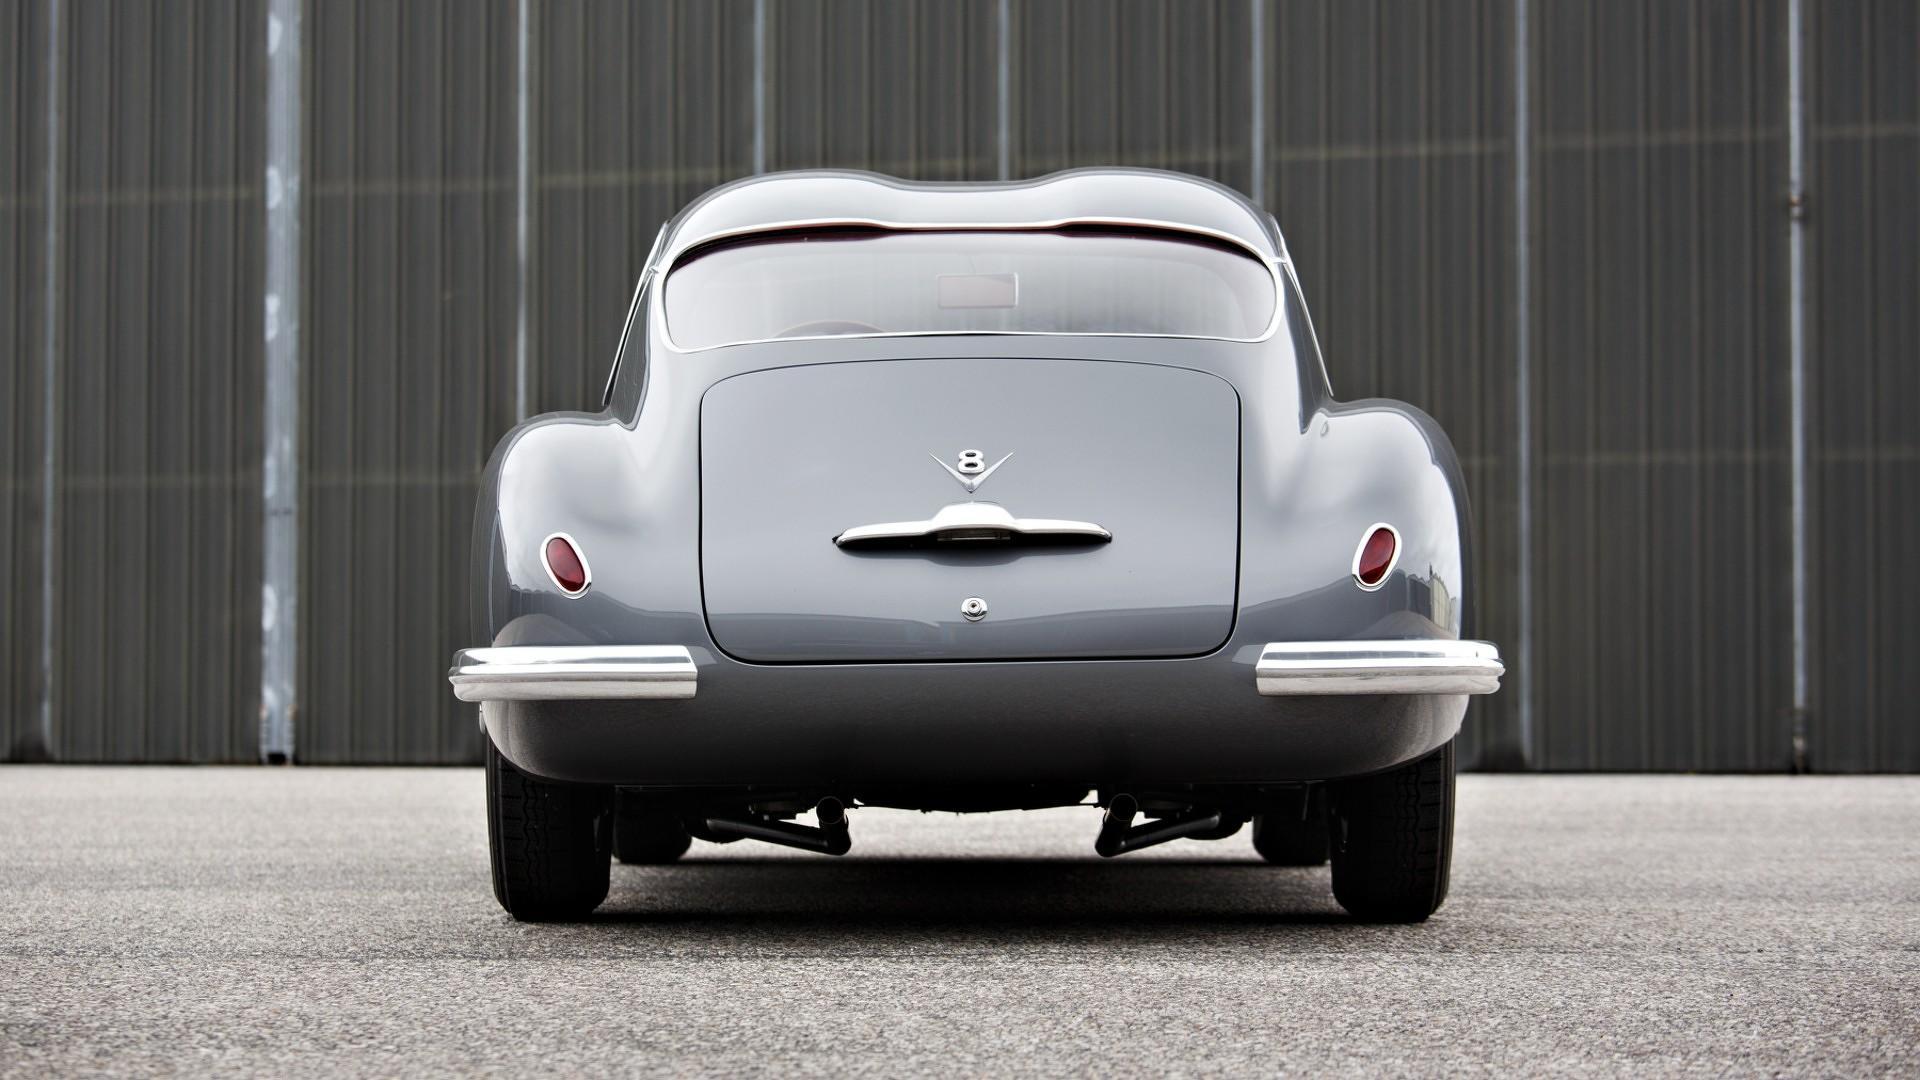 1953-fiat-8v-berlinetta-elaborata-copyright-gooding-company-brian-henniker (2)